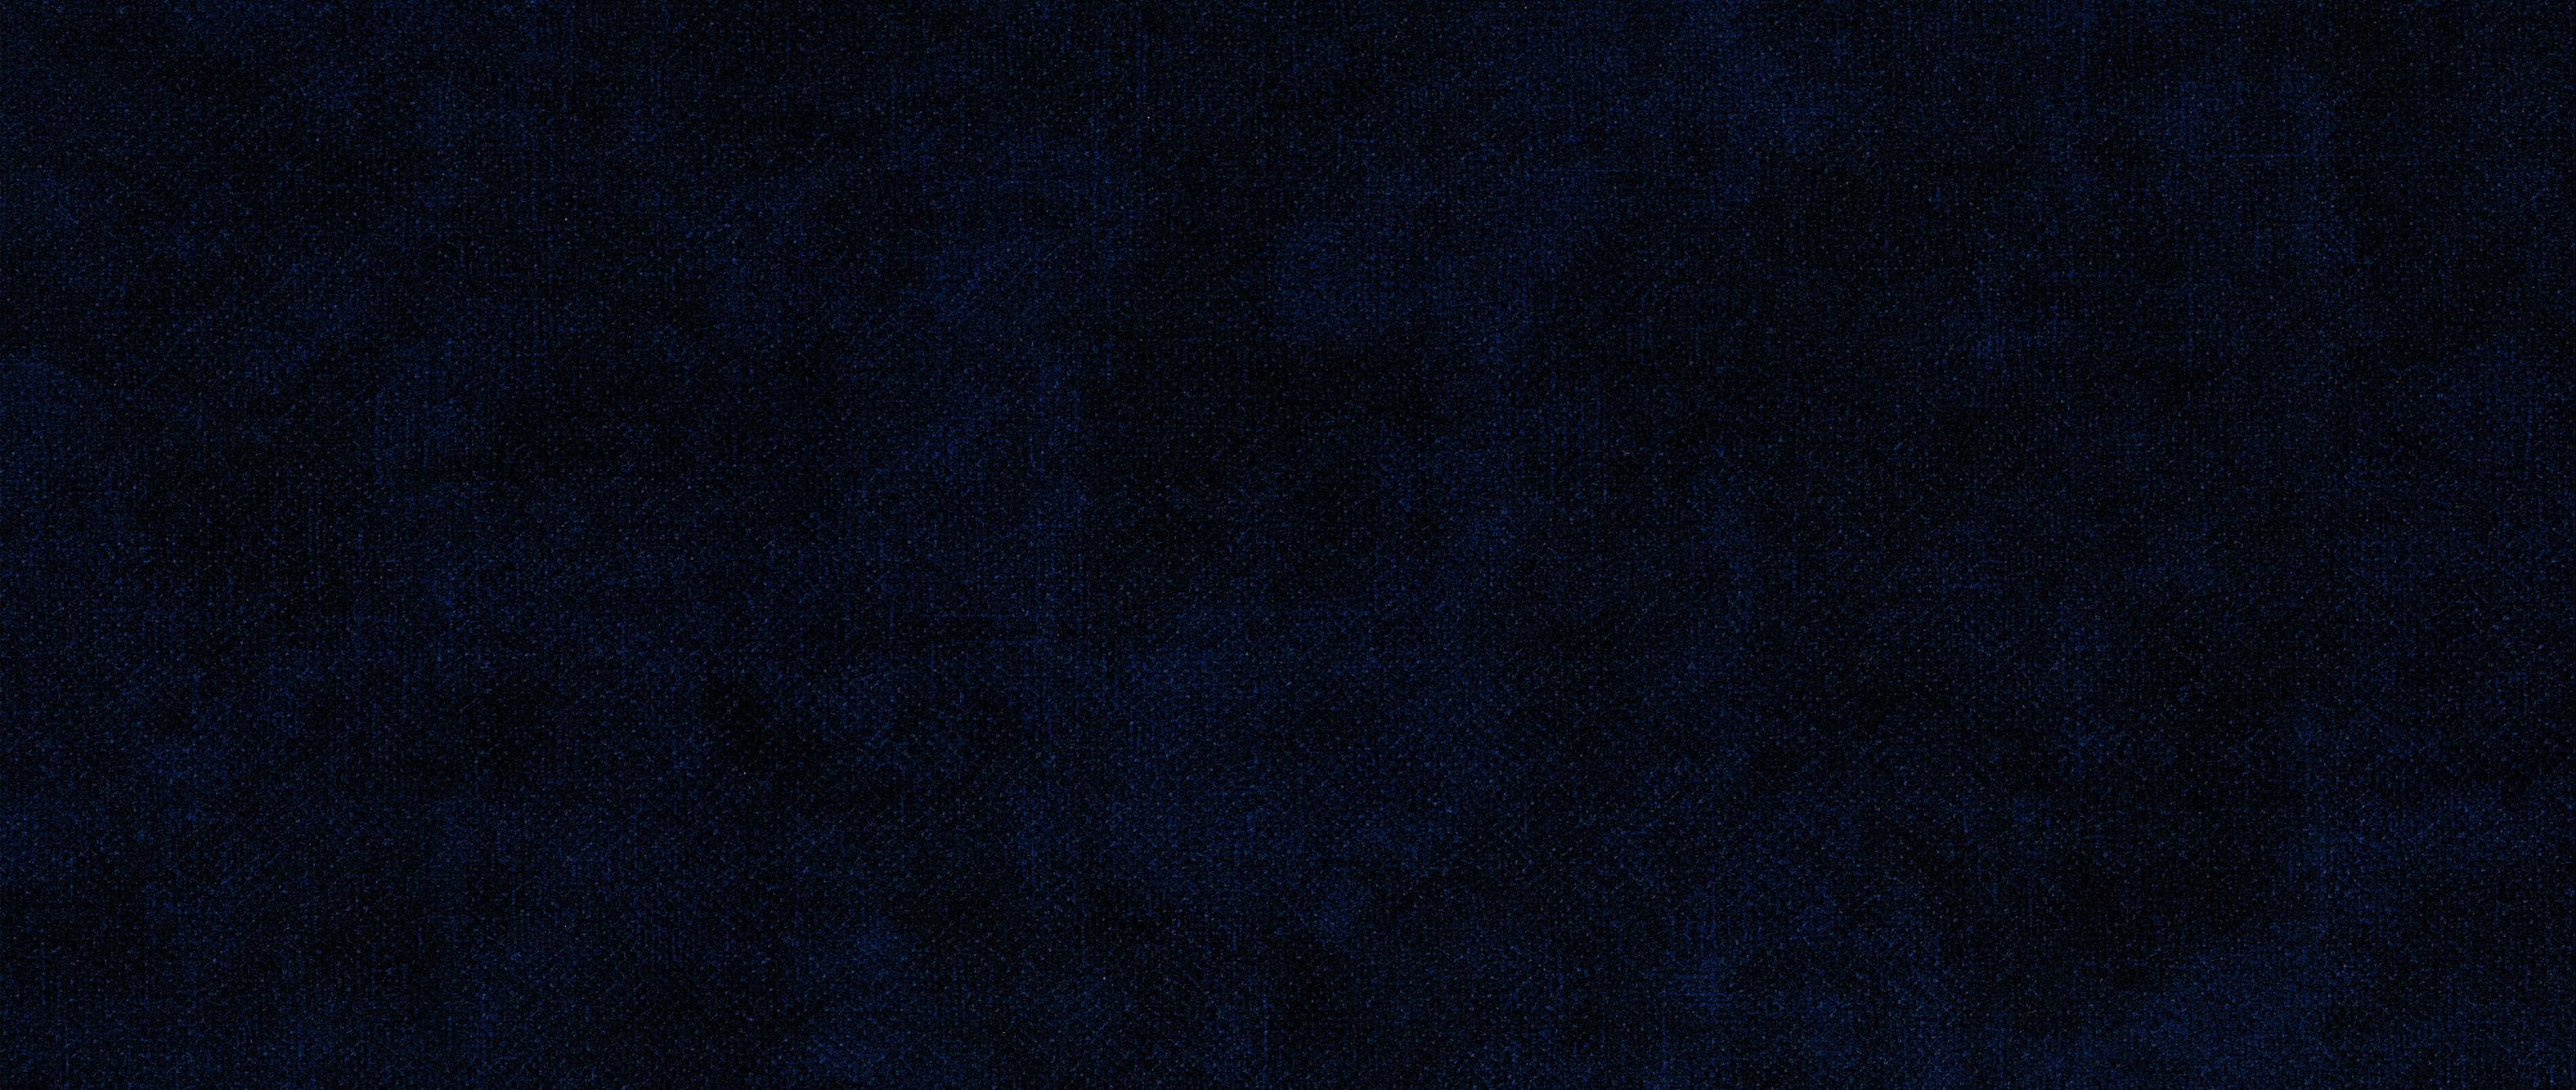 Kolor skóry: terra 79 plaskie